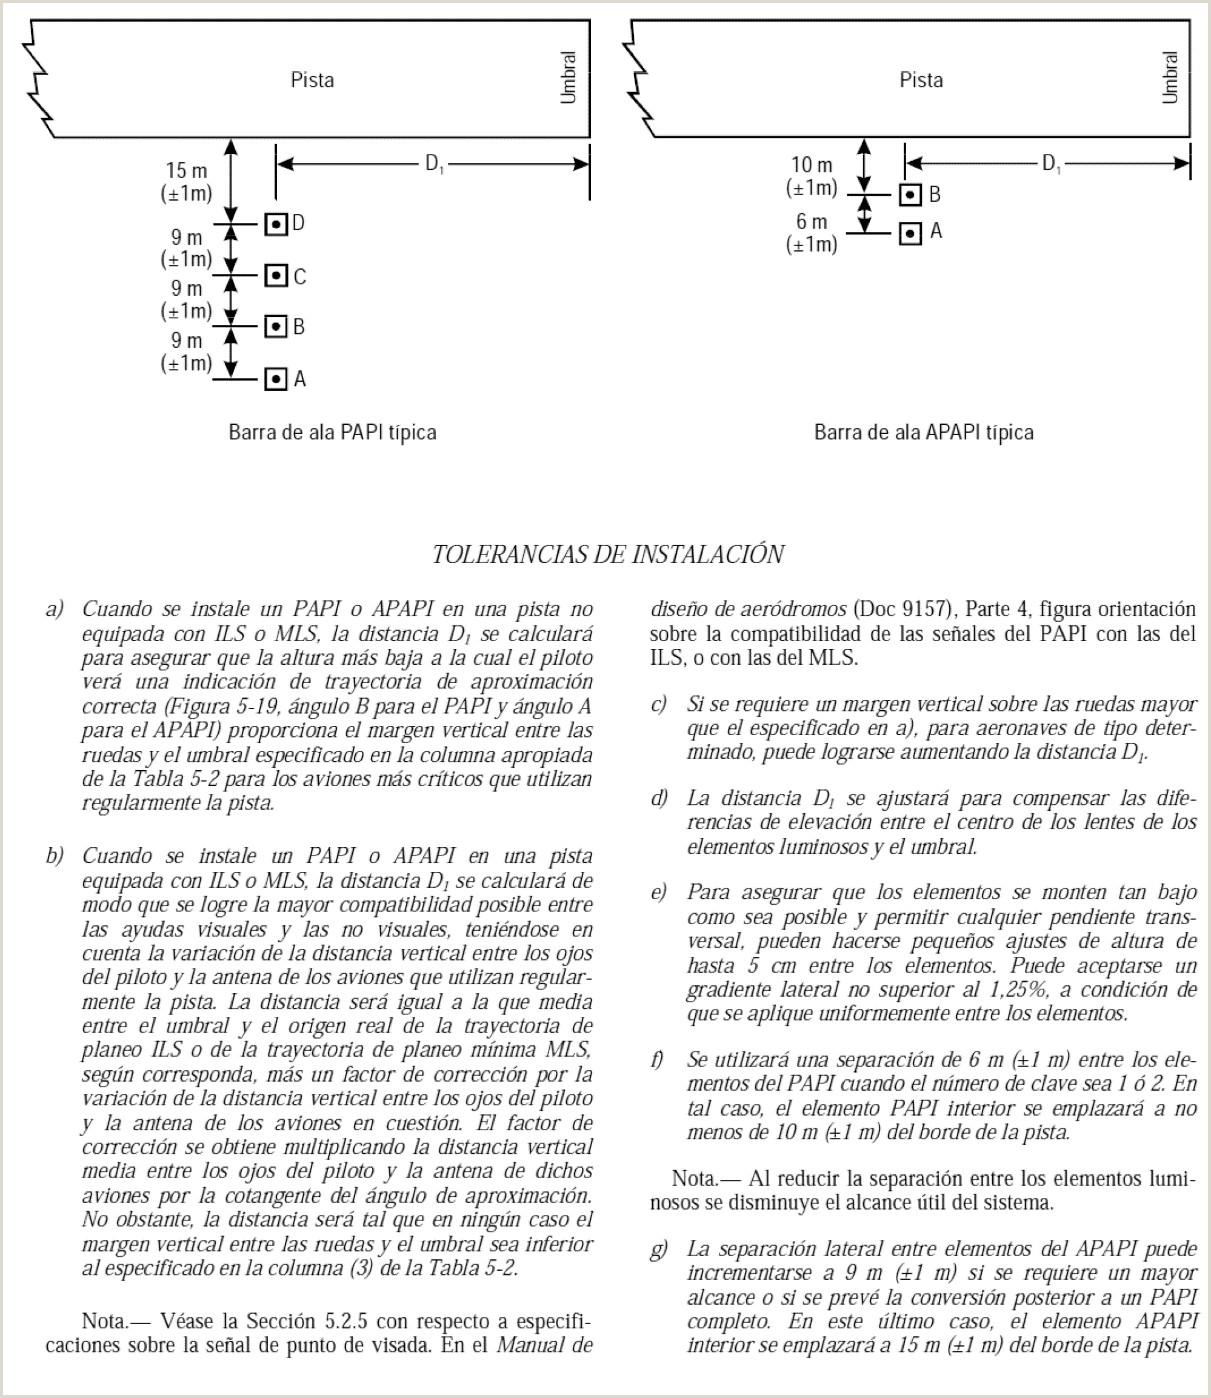 Hoja De Vida formato Unico Editar Boe Documento Consolidado Boe A 2009 9043